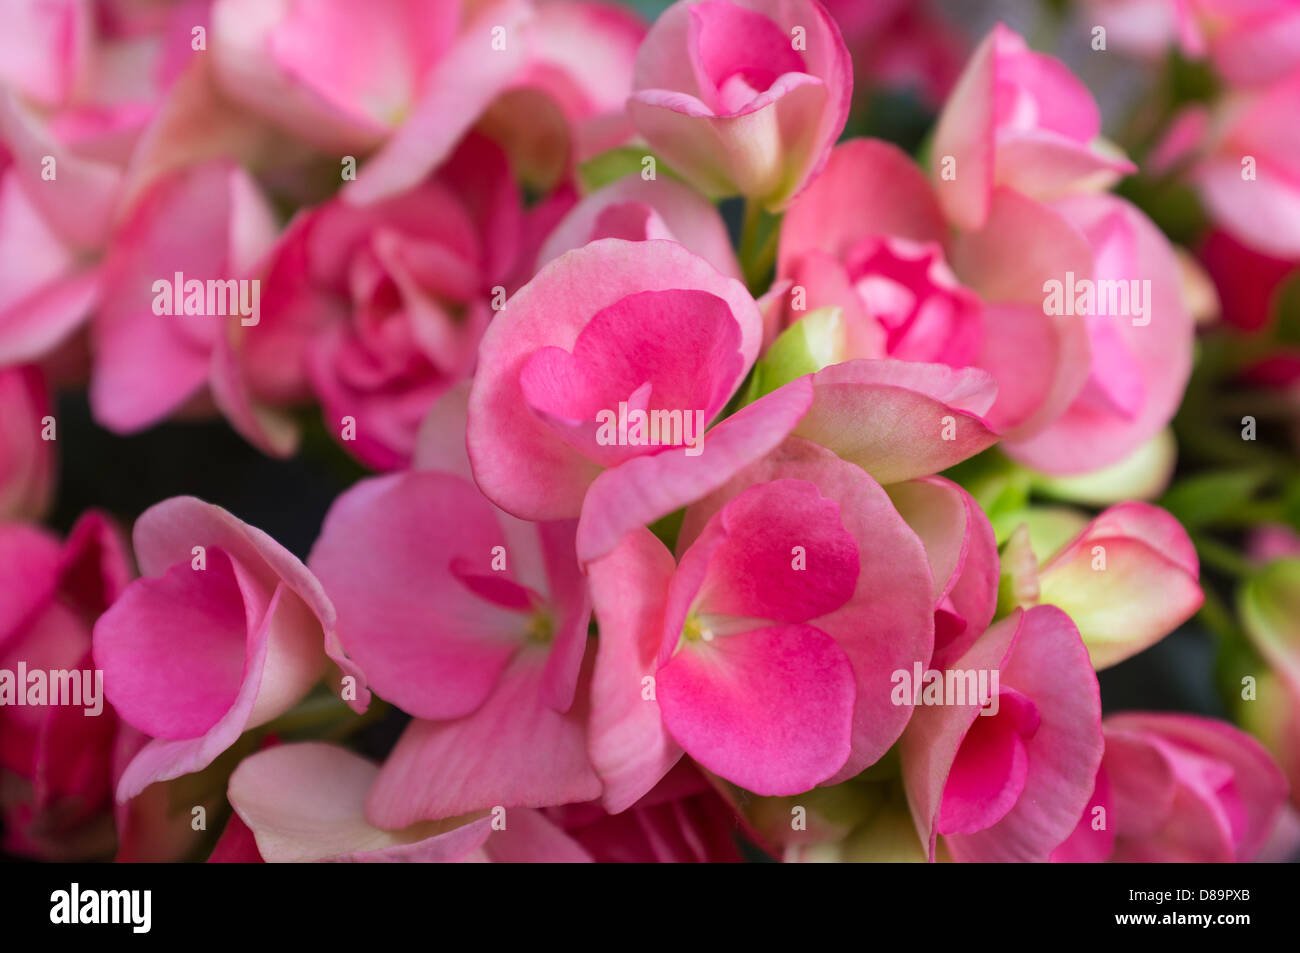 Begonia is a genus of perennial flowering plants the genus contains begonia is a genus of perennial flowering plants the genus contains about 1400 different plant species natives of tropics mightylinksfo